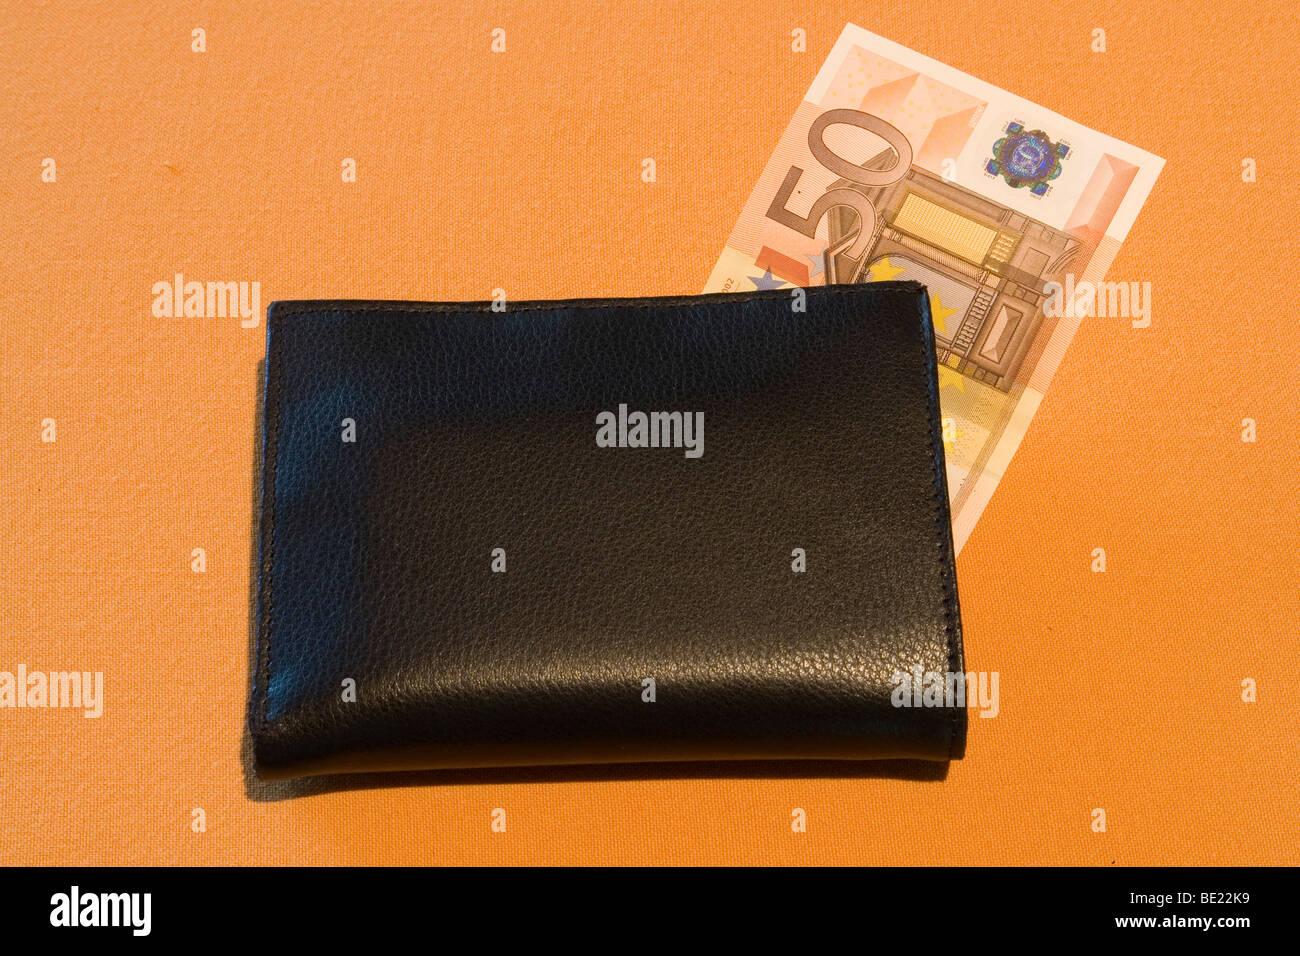 Un monedero negro con un billete de euro (Francia). Portefeuille noir avec billet de banque Euro (Francia). Foto de stock